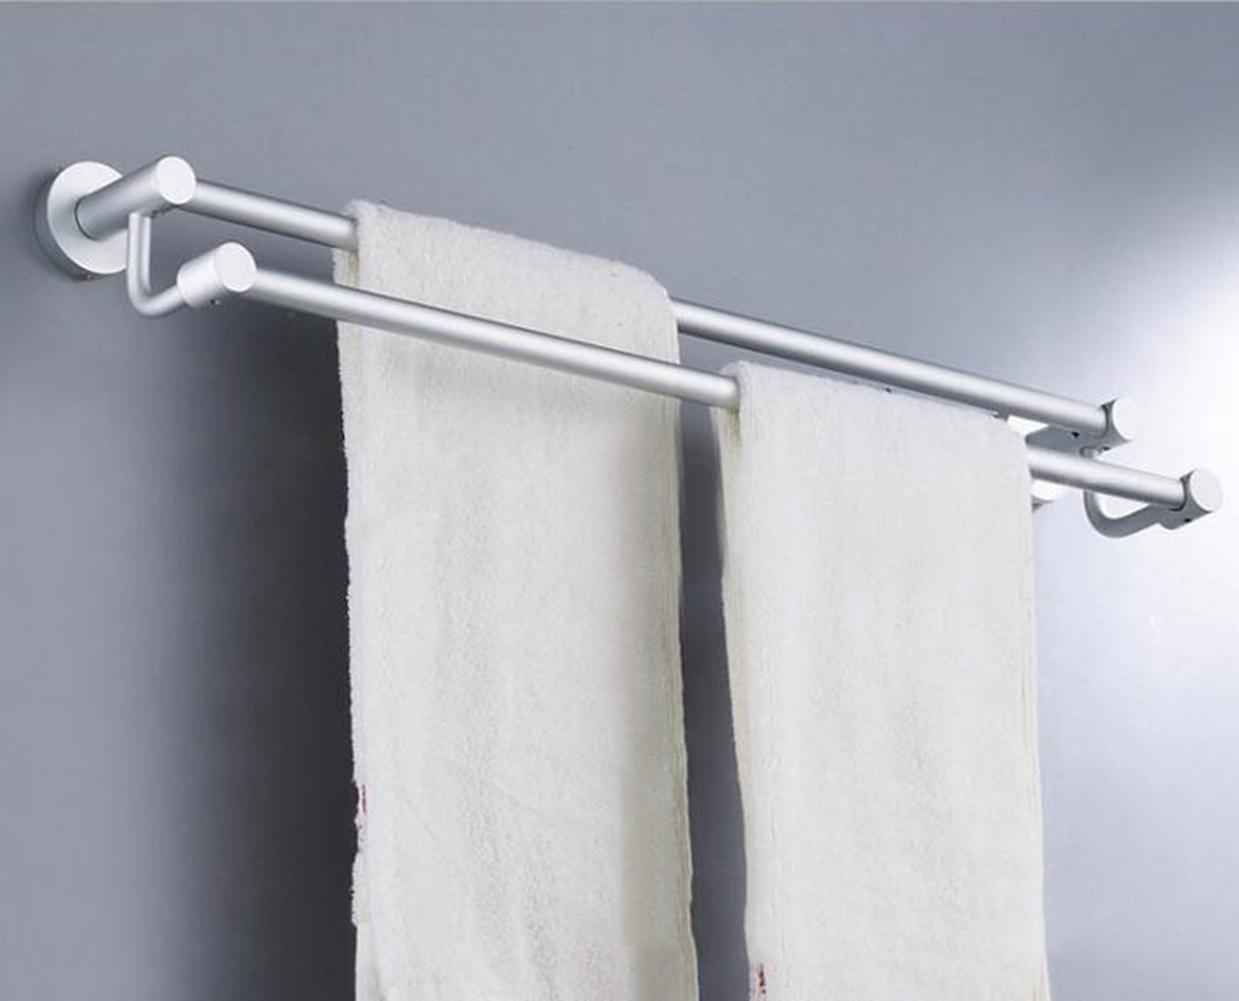 Space Aluminum 2 Tier Towel Rack Bathroom Accessories Towel Bar Holder